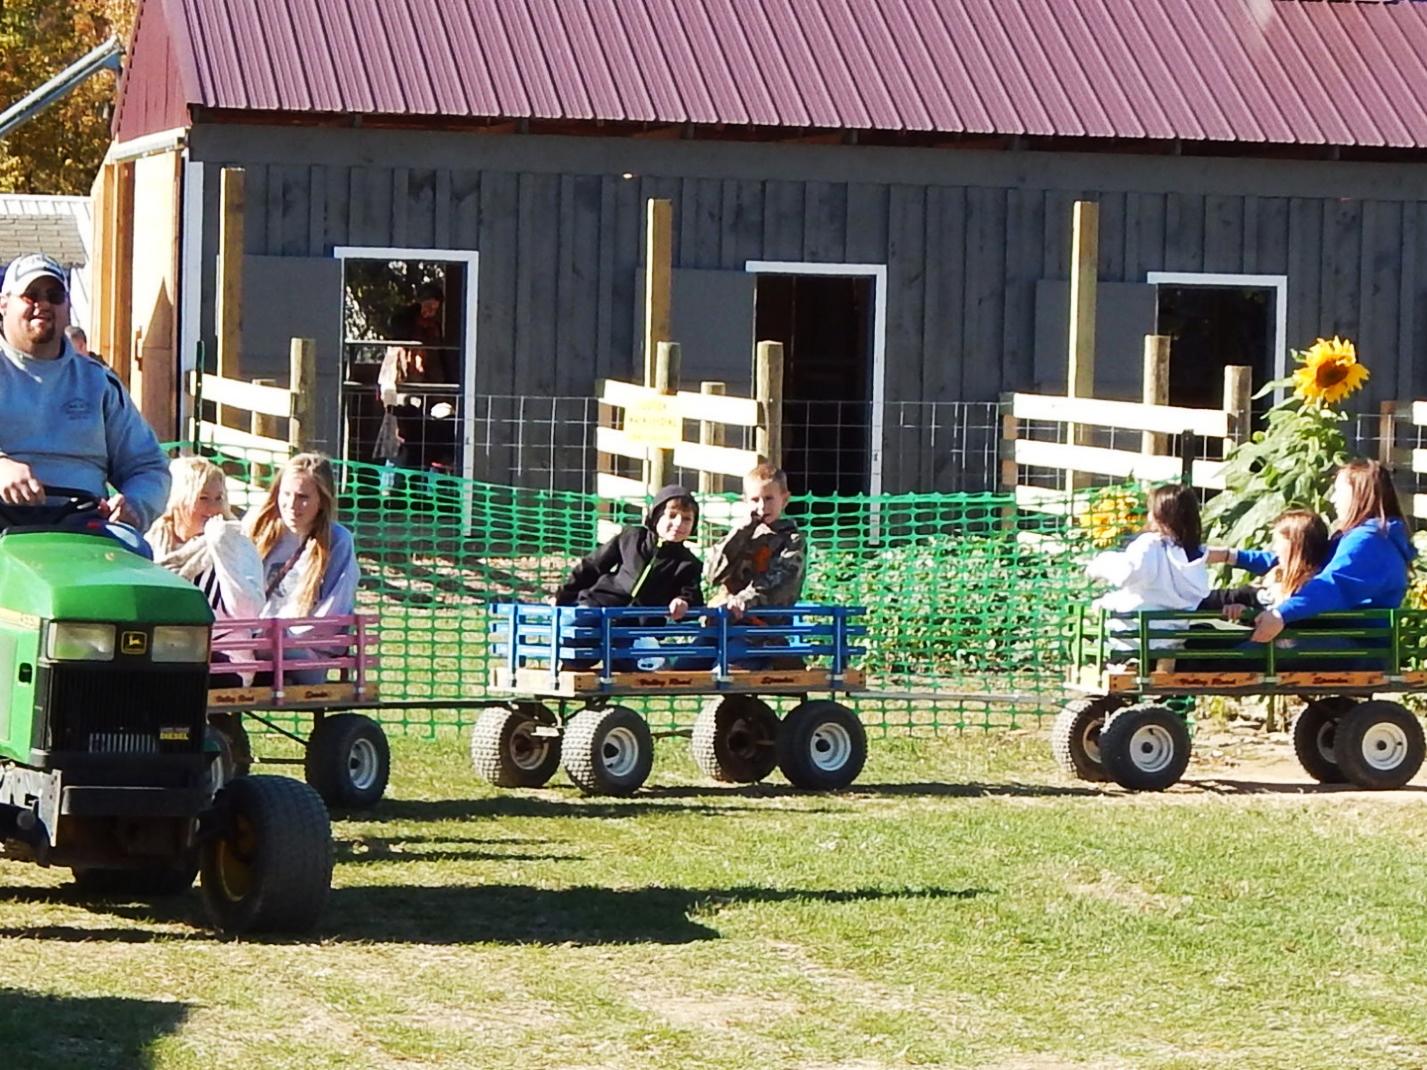 Kids riding wagons at Kesicke Farm in Rhinebeck, New York